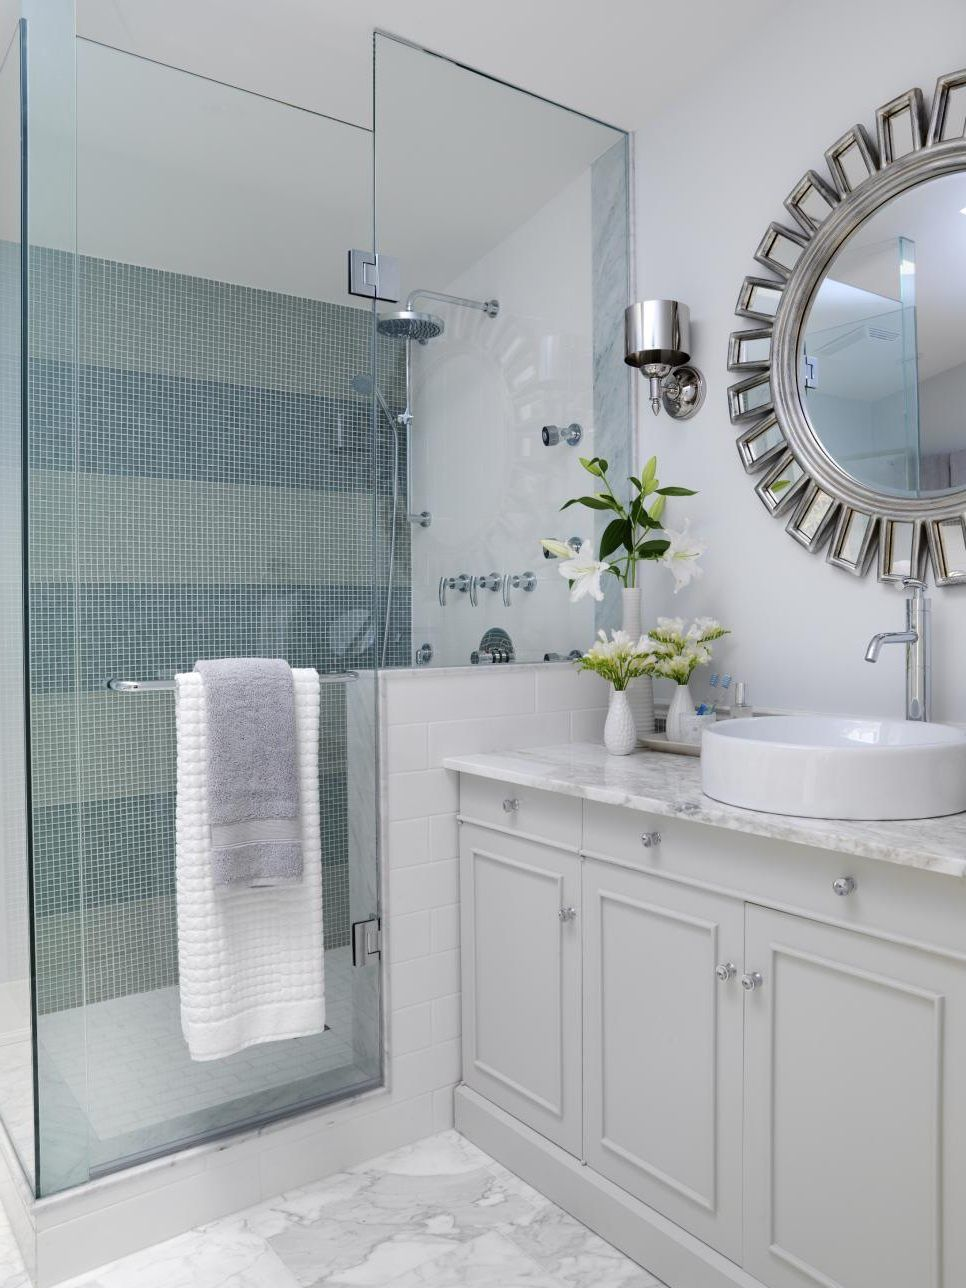 floor and on depot elegant tiles bathroom tile home kitchen appealing at ideas stunning